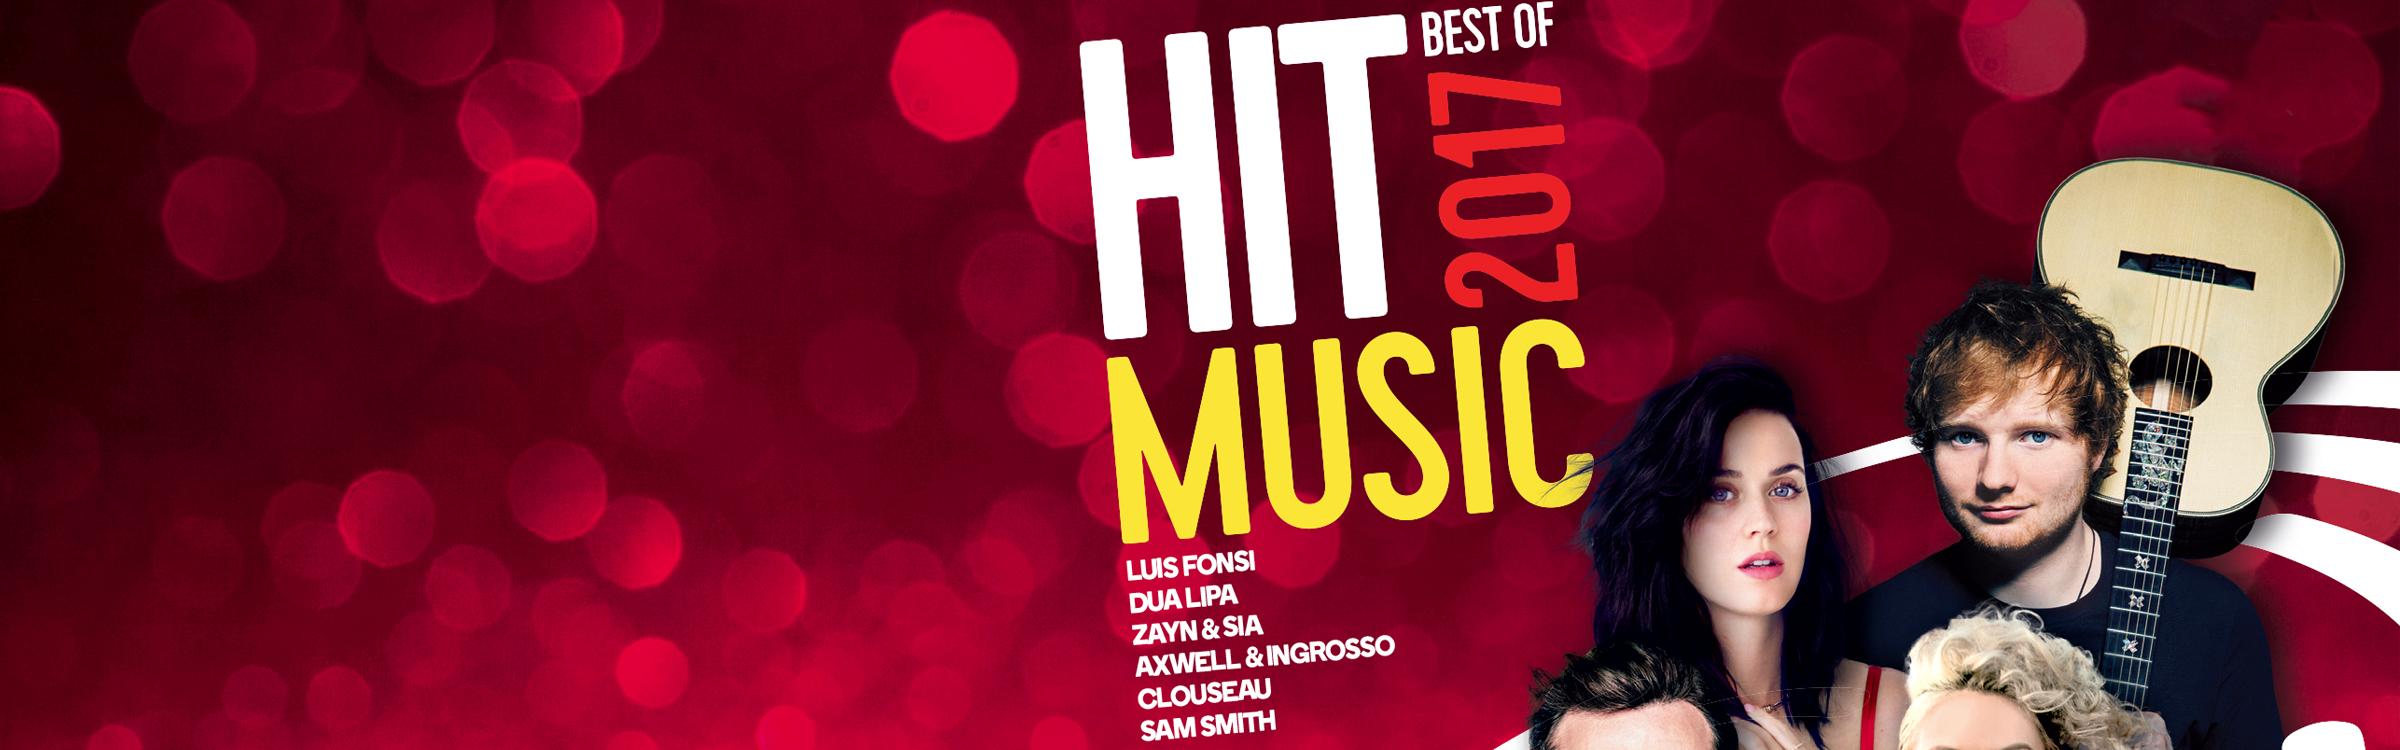 Hitmusic header